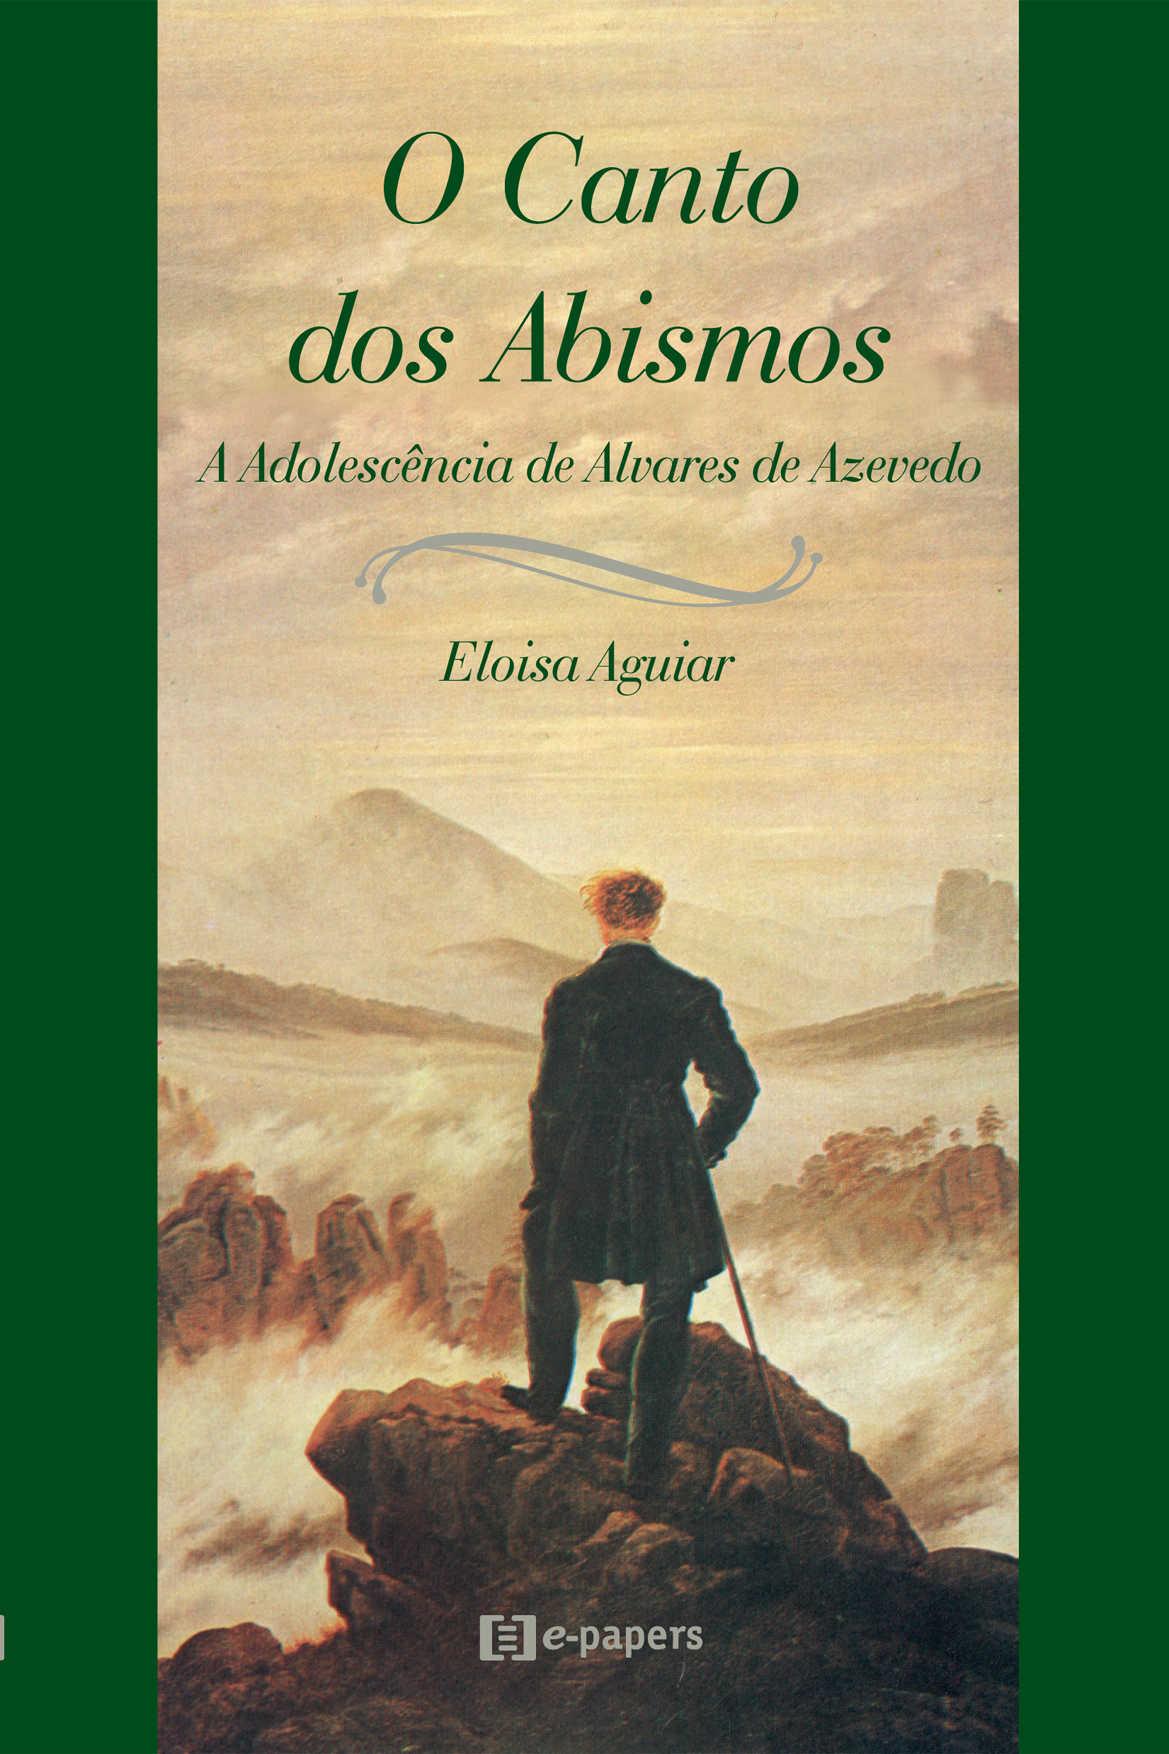 O Canto dos Abismos: A adolescência de Álvares de Azevedo